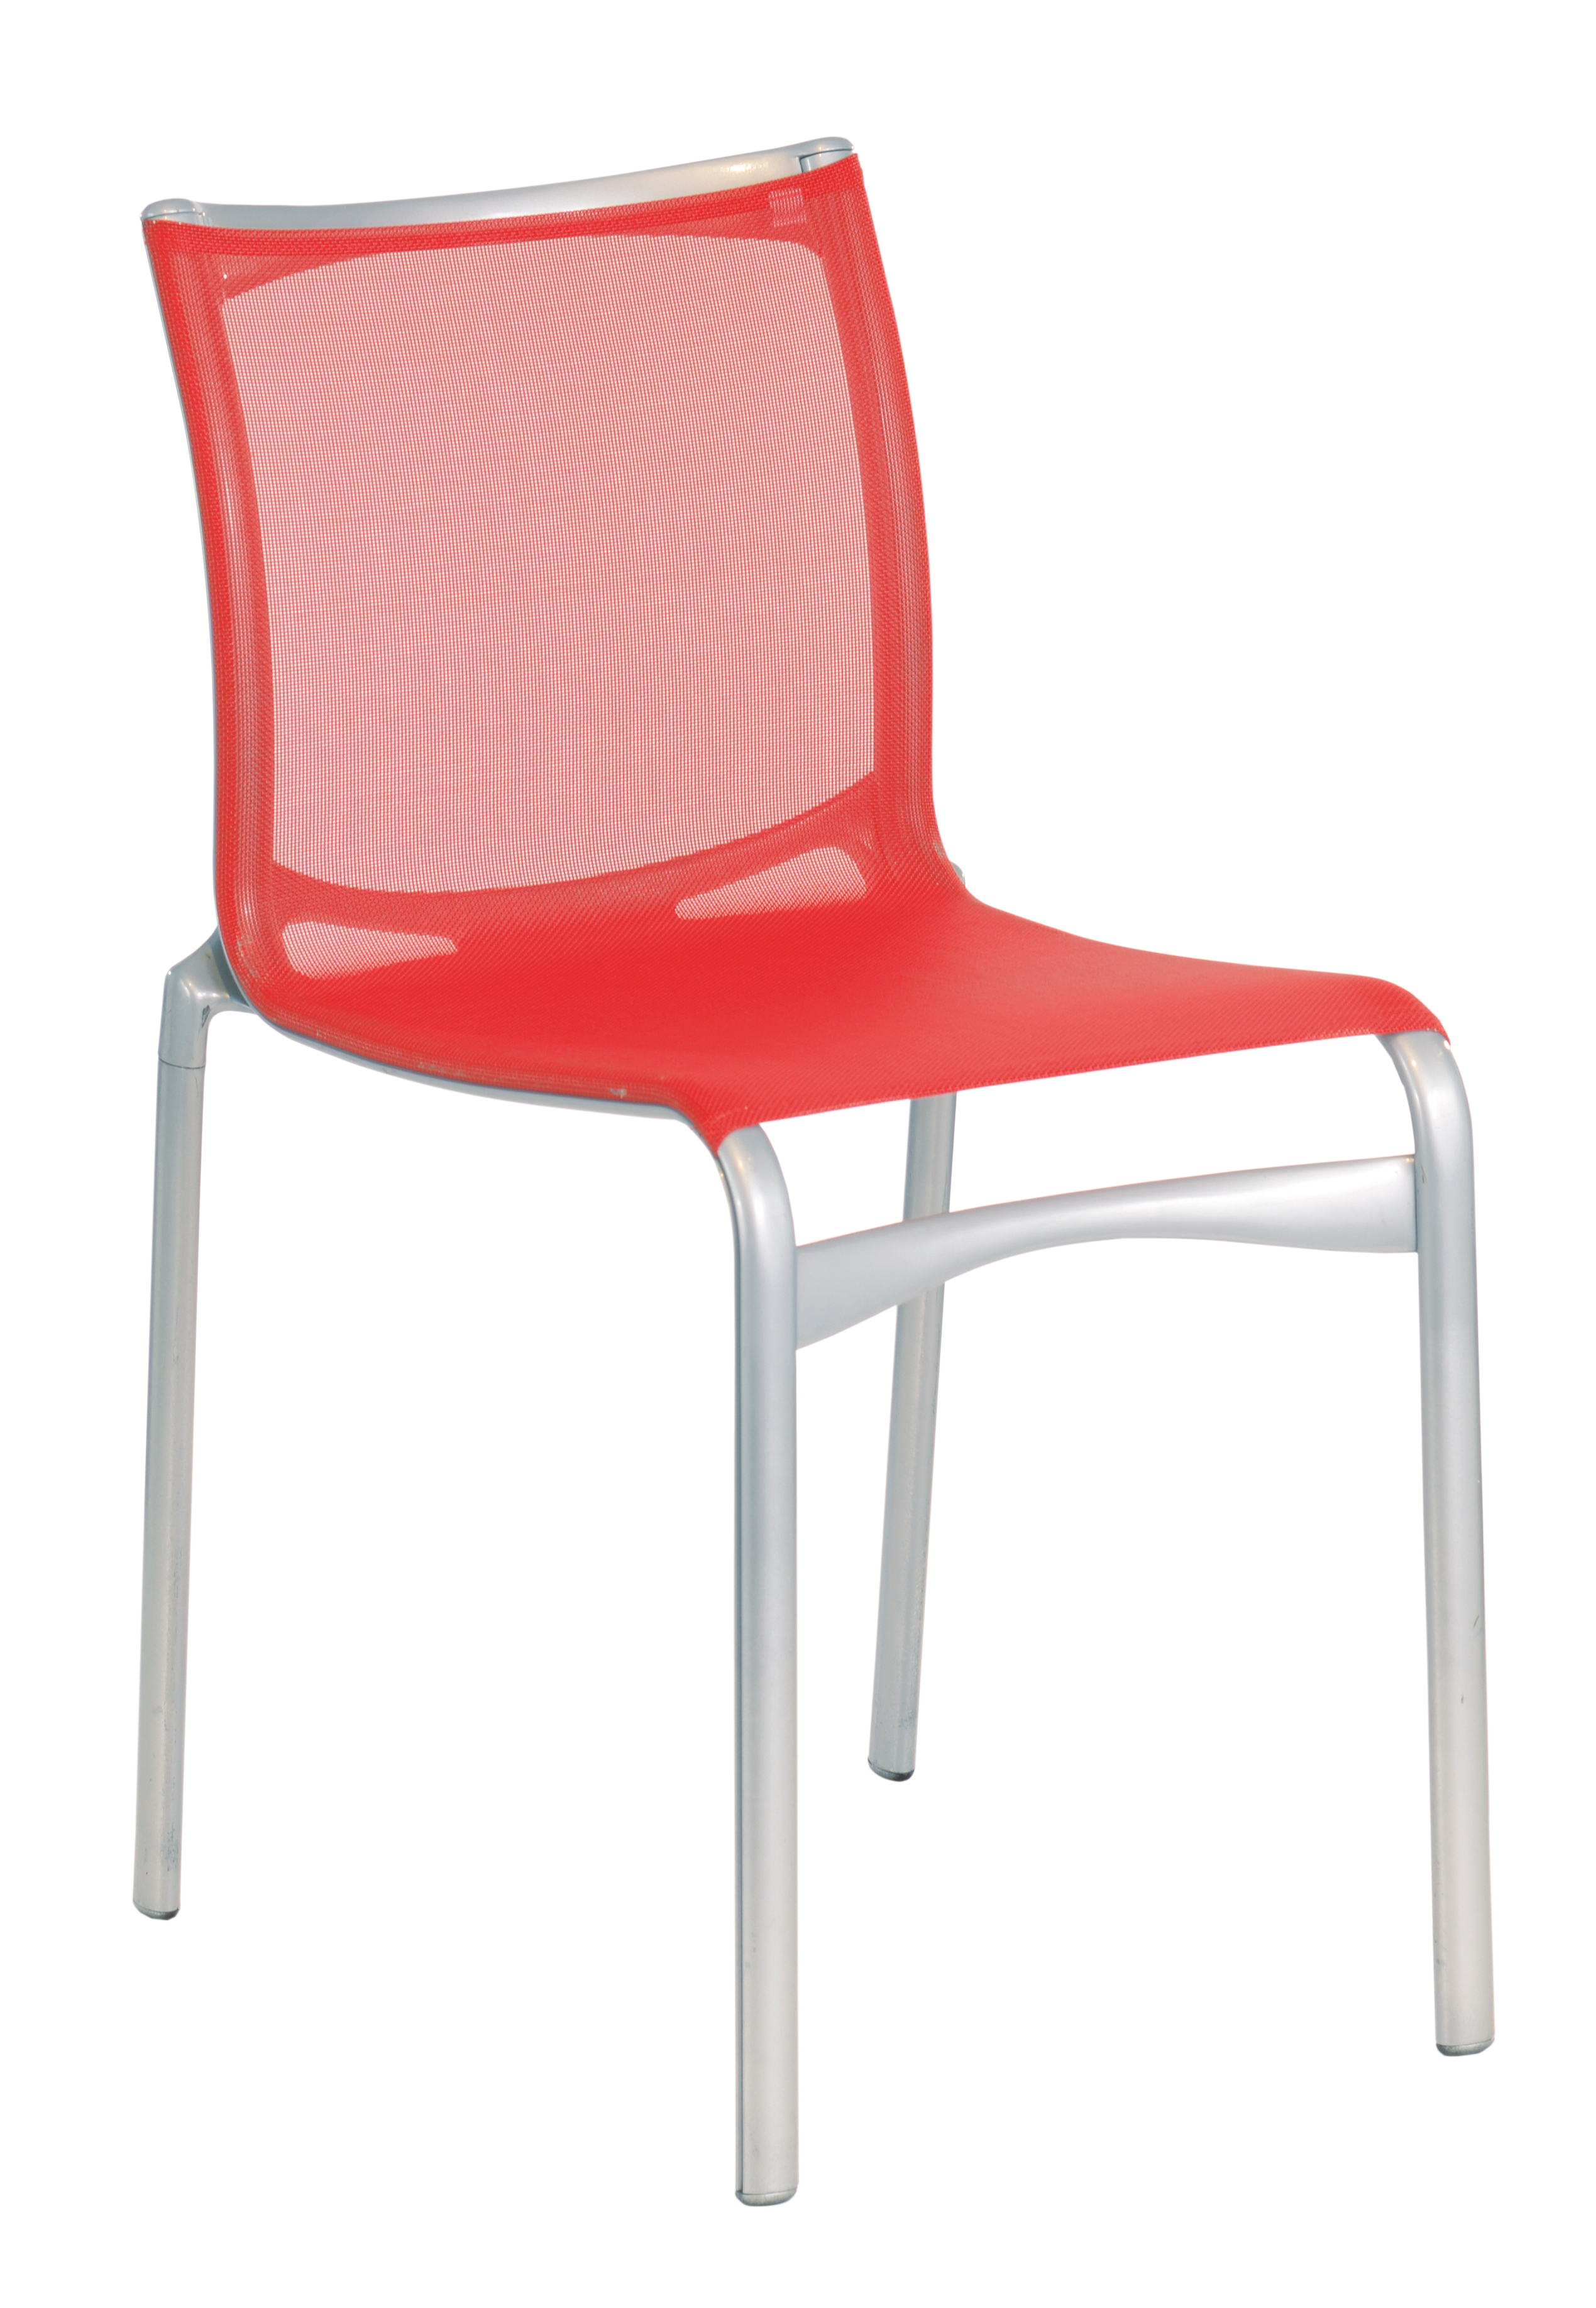 Design-Stuhl Highframe 40/416 (Indoor, Outdoor, Alias - Netzstuhl, stapelbar) - MEGA-reduziert!